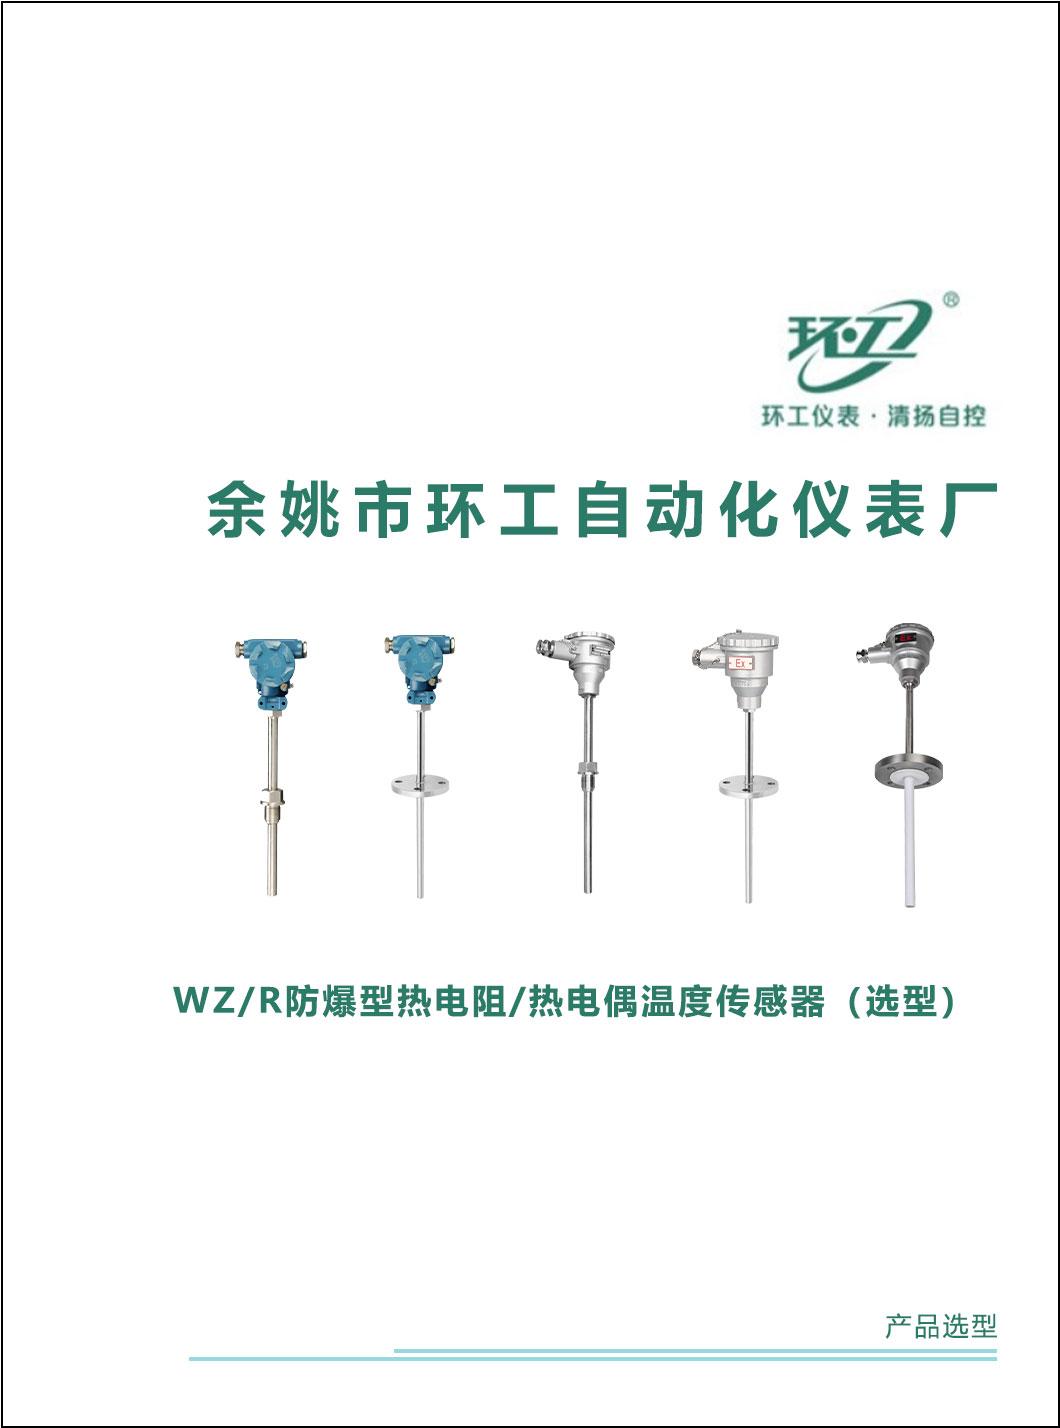 WZ/R防爆型热电阻/热电偶温度传感器-环工仪表-清扬自控